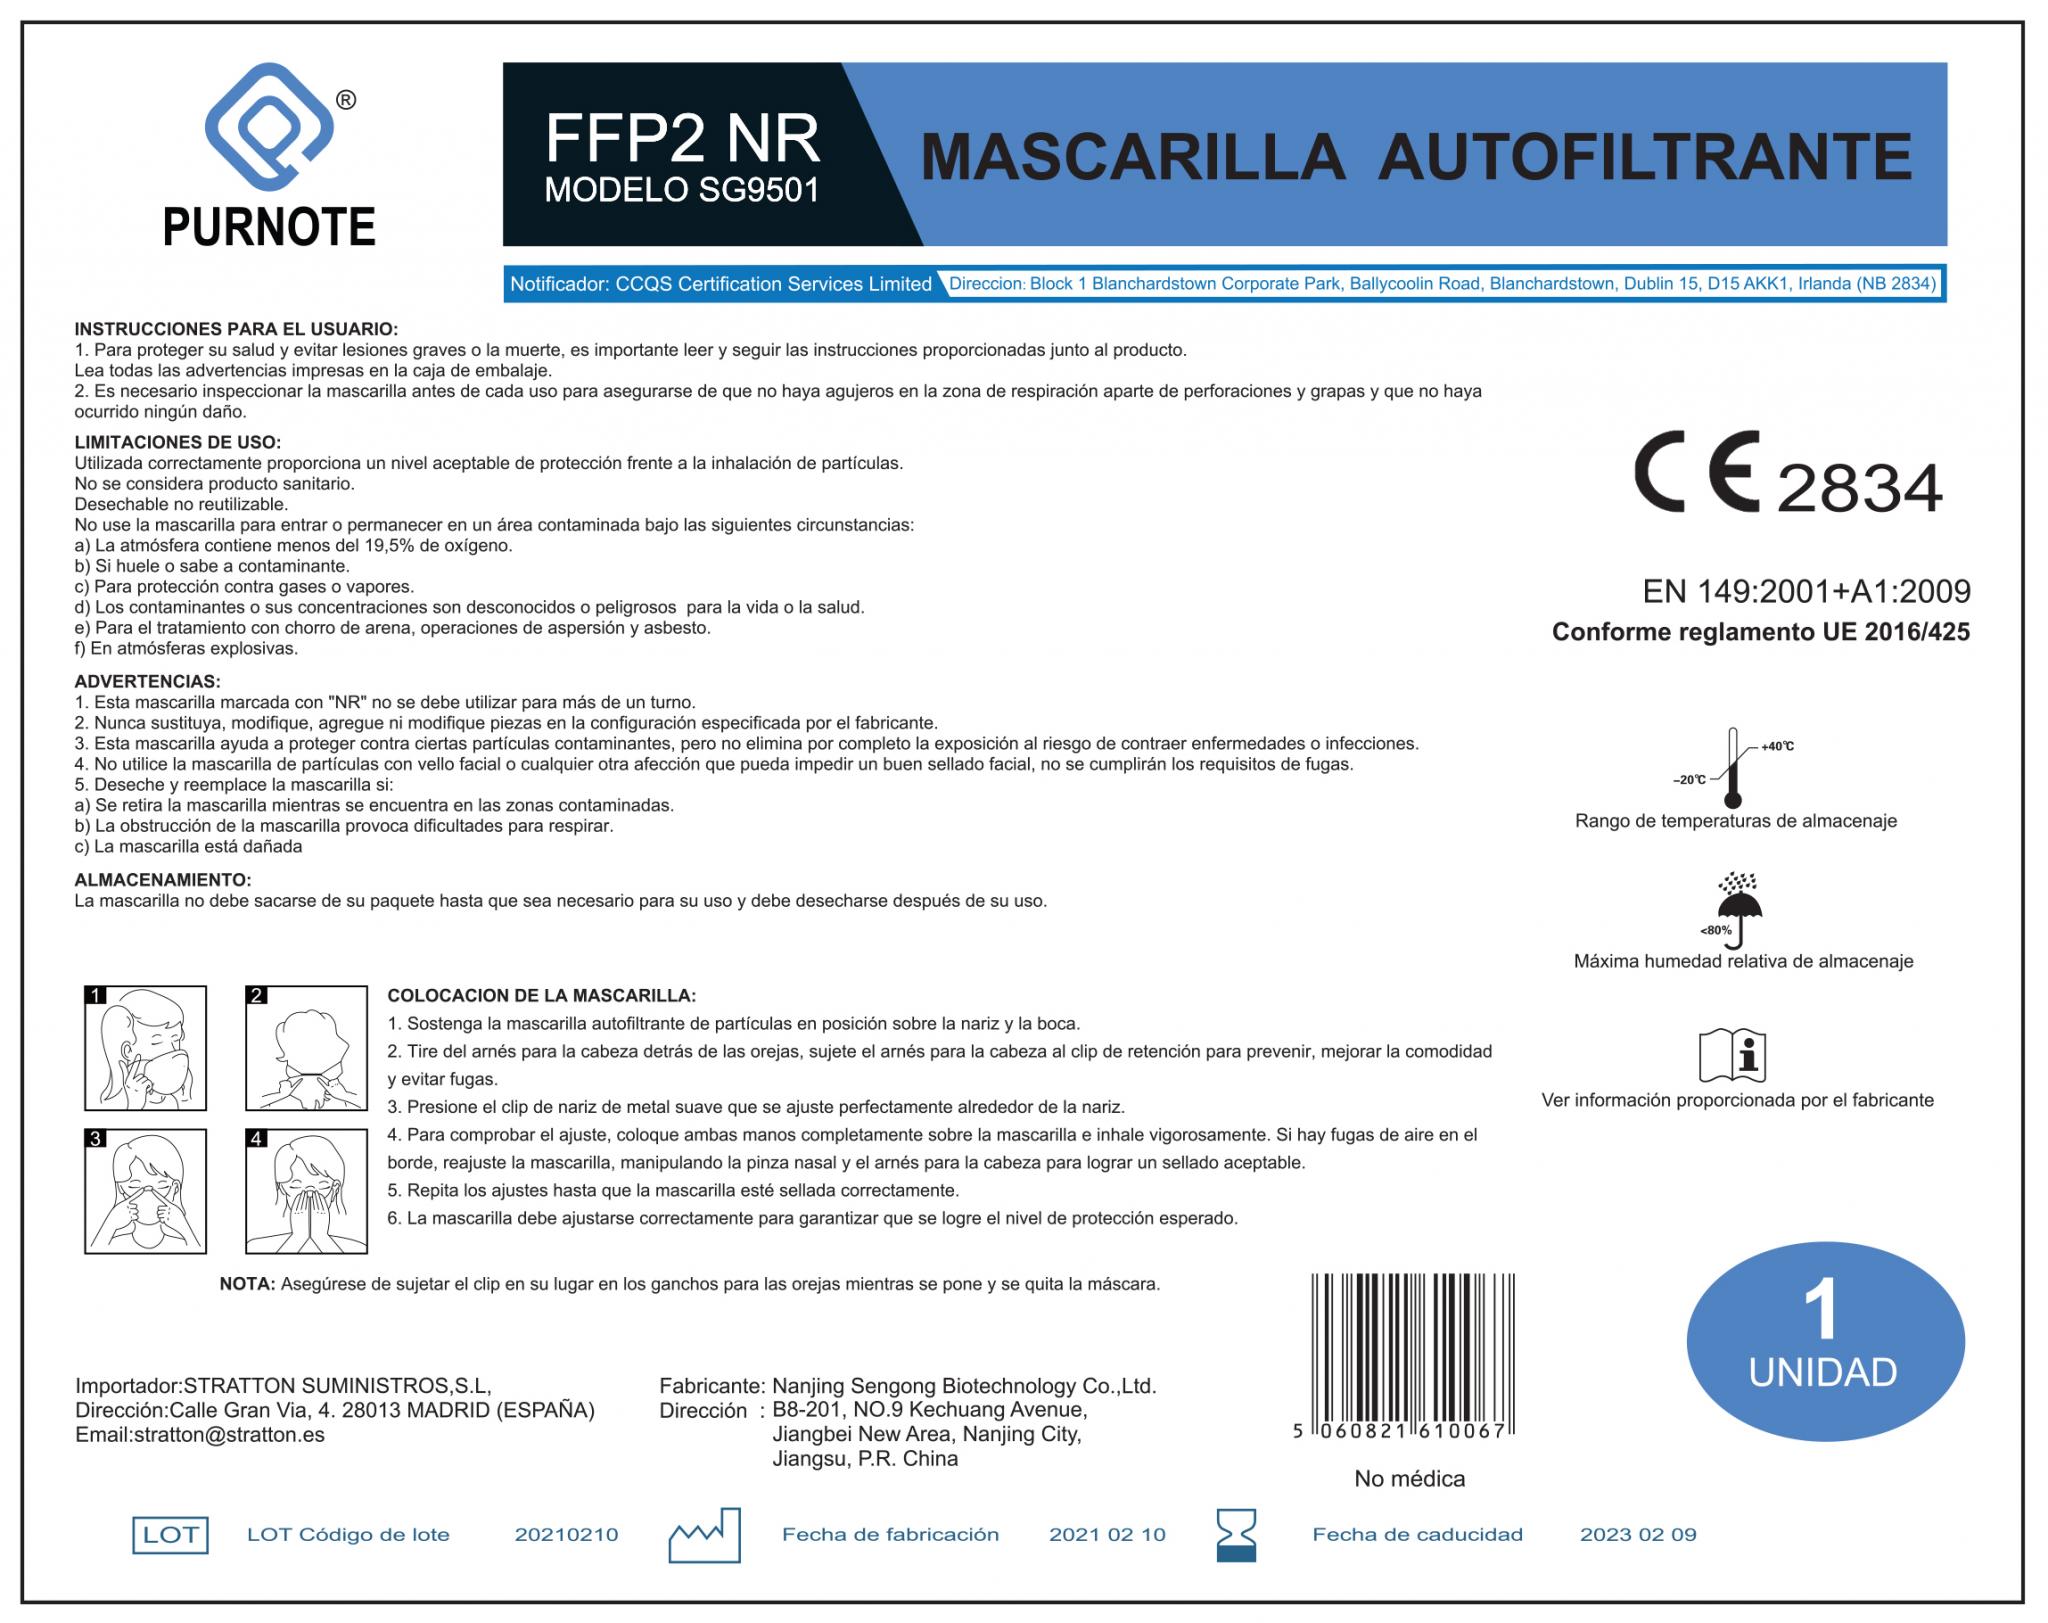 Instrucciones de uso de la mascarilla FFP2 Purnote